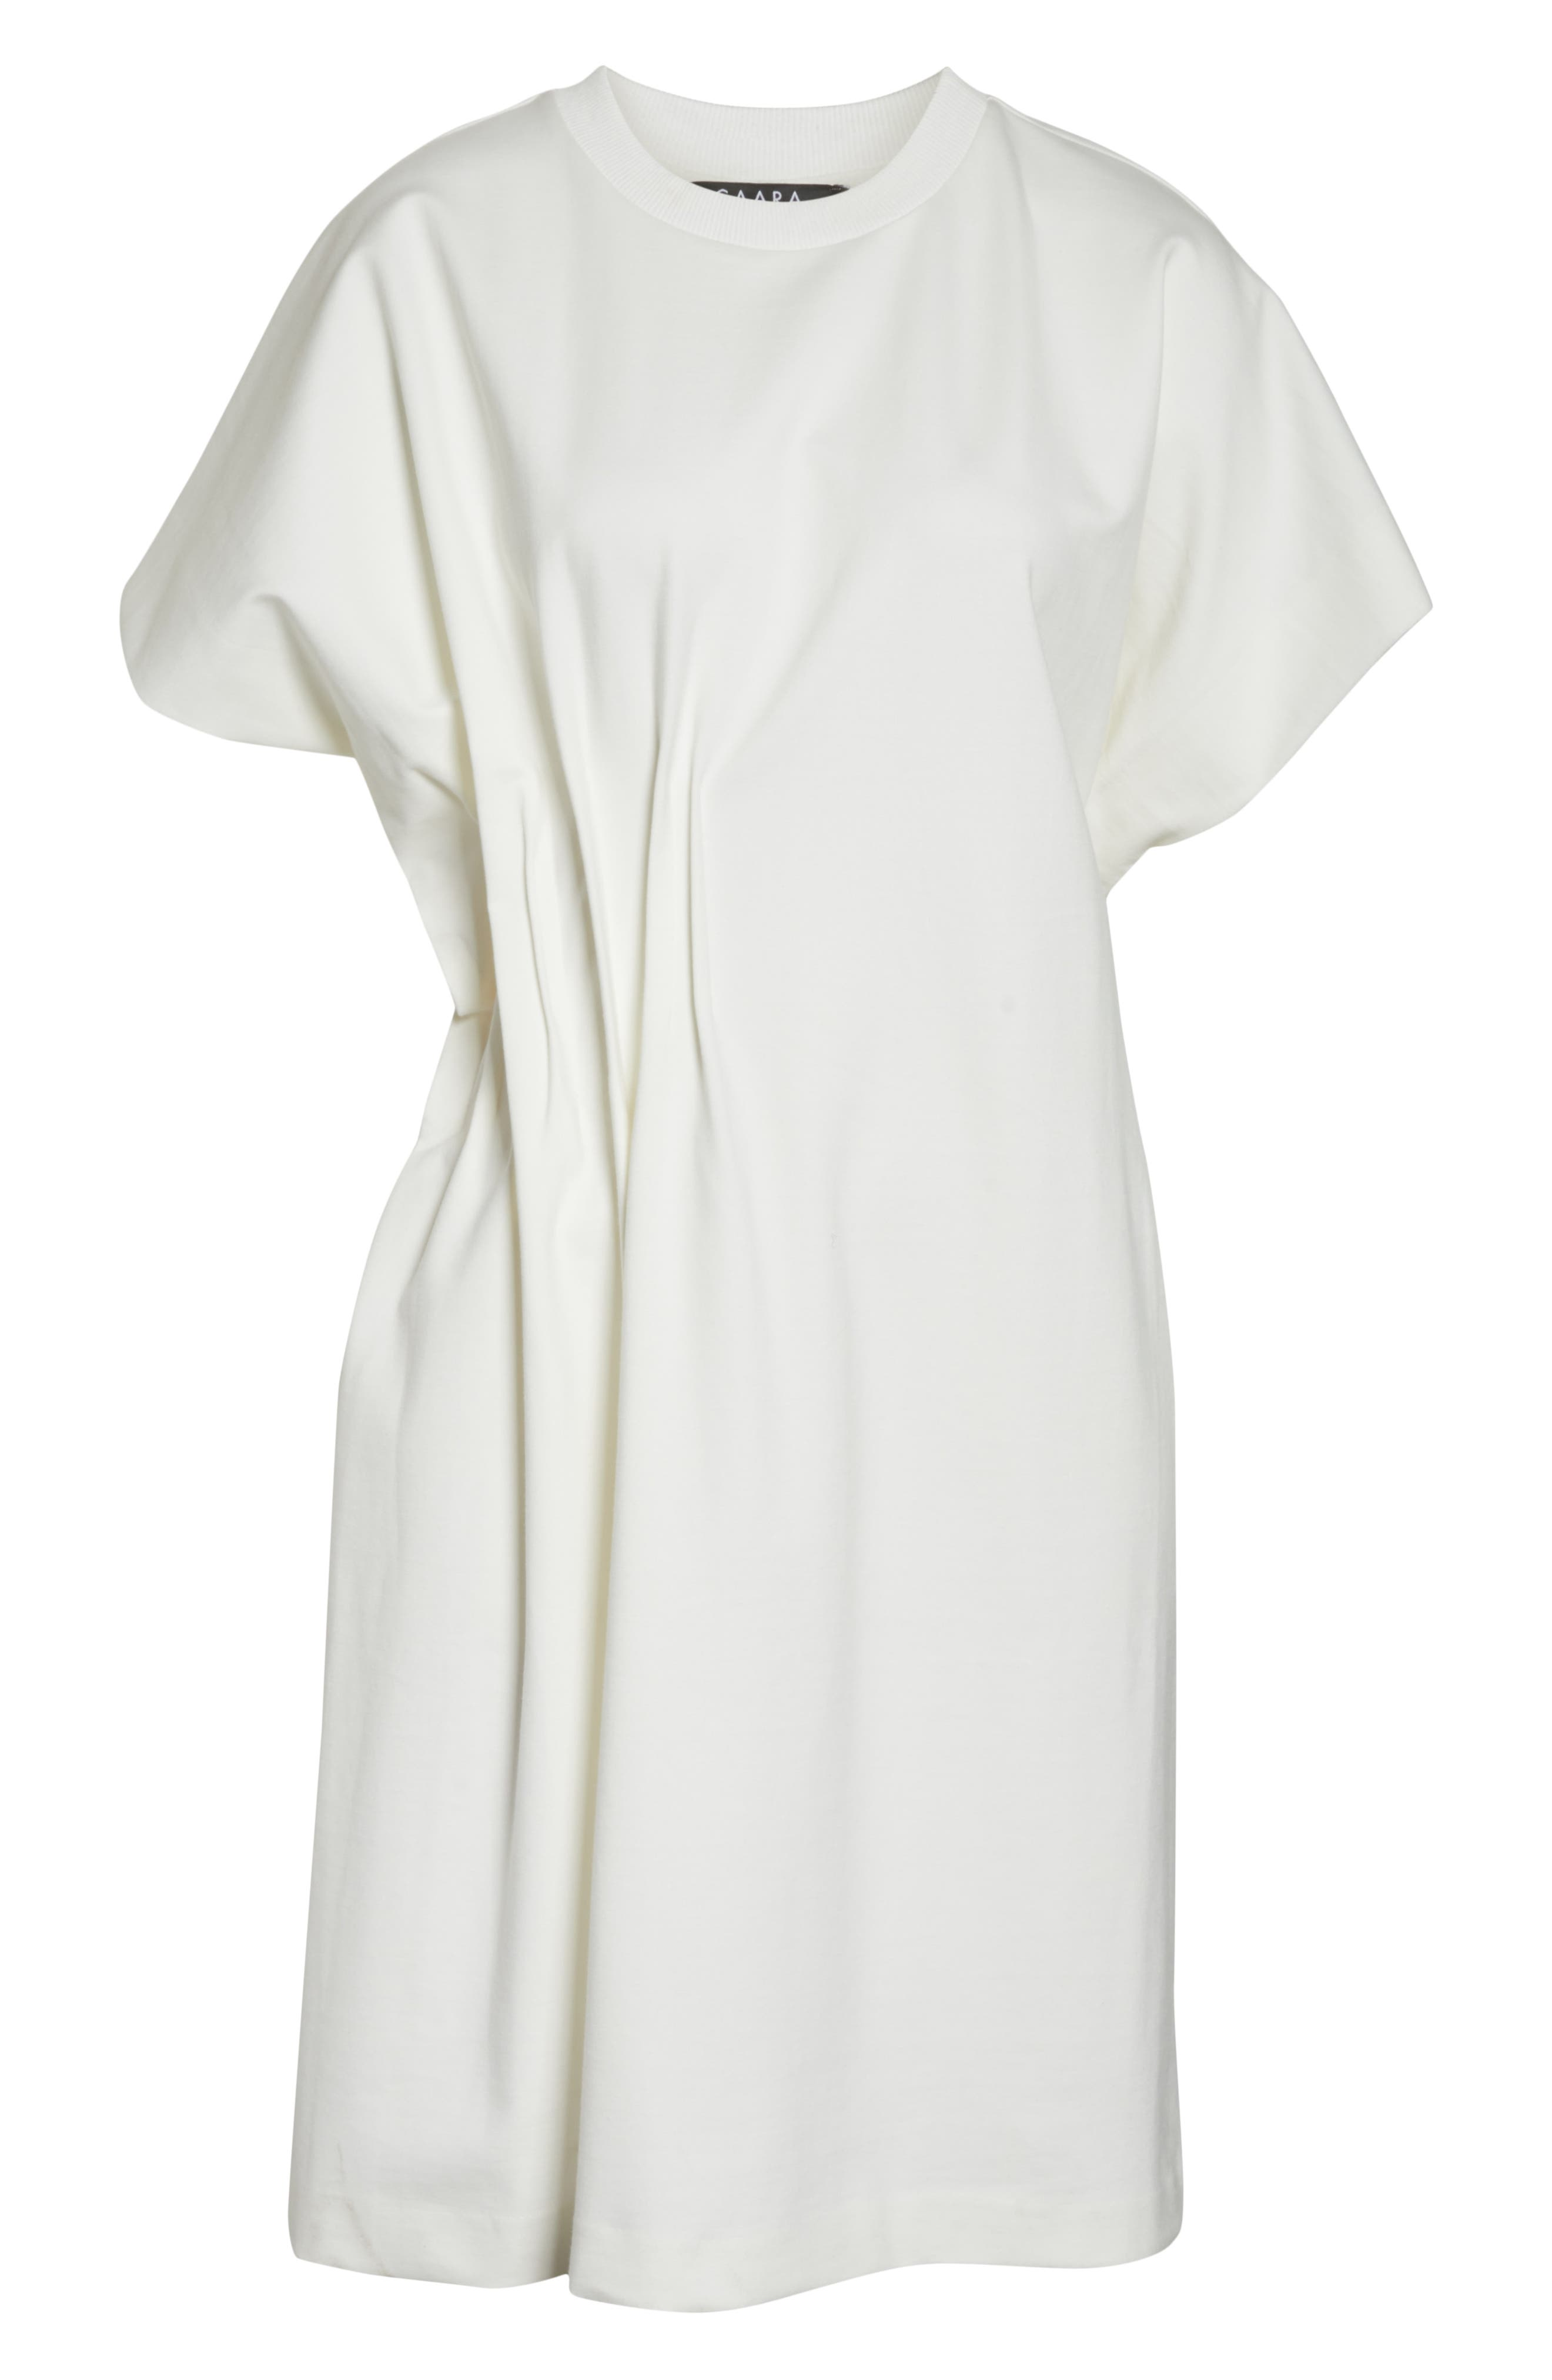 CAARA, Looma T-Shirt Dress, Alternate thumbnail 7, color, WHITE